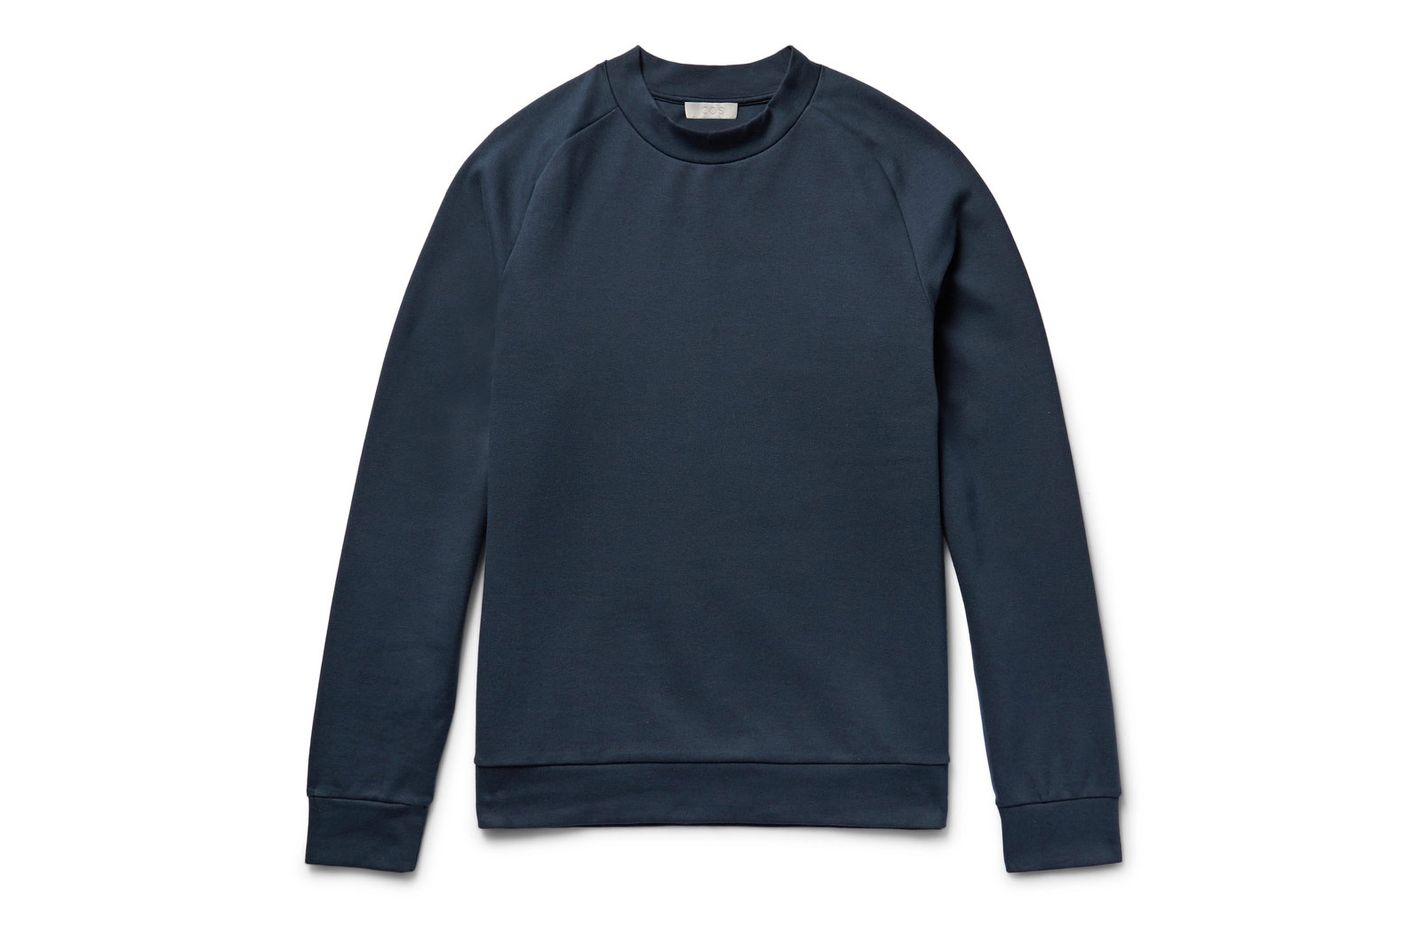 COS Stretch Cotton-Blend Jersey Sweatshirt